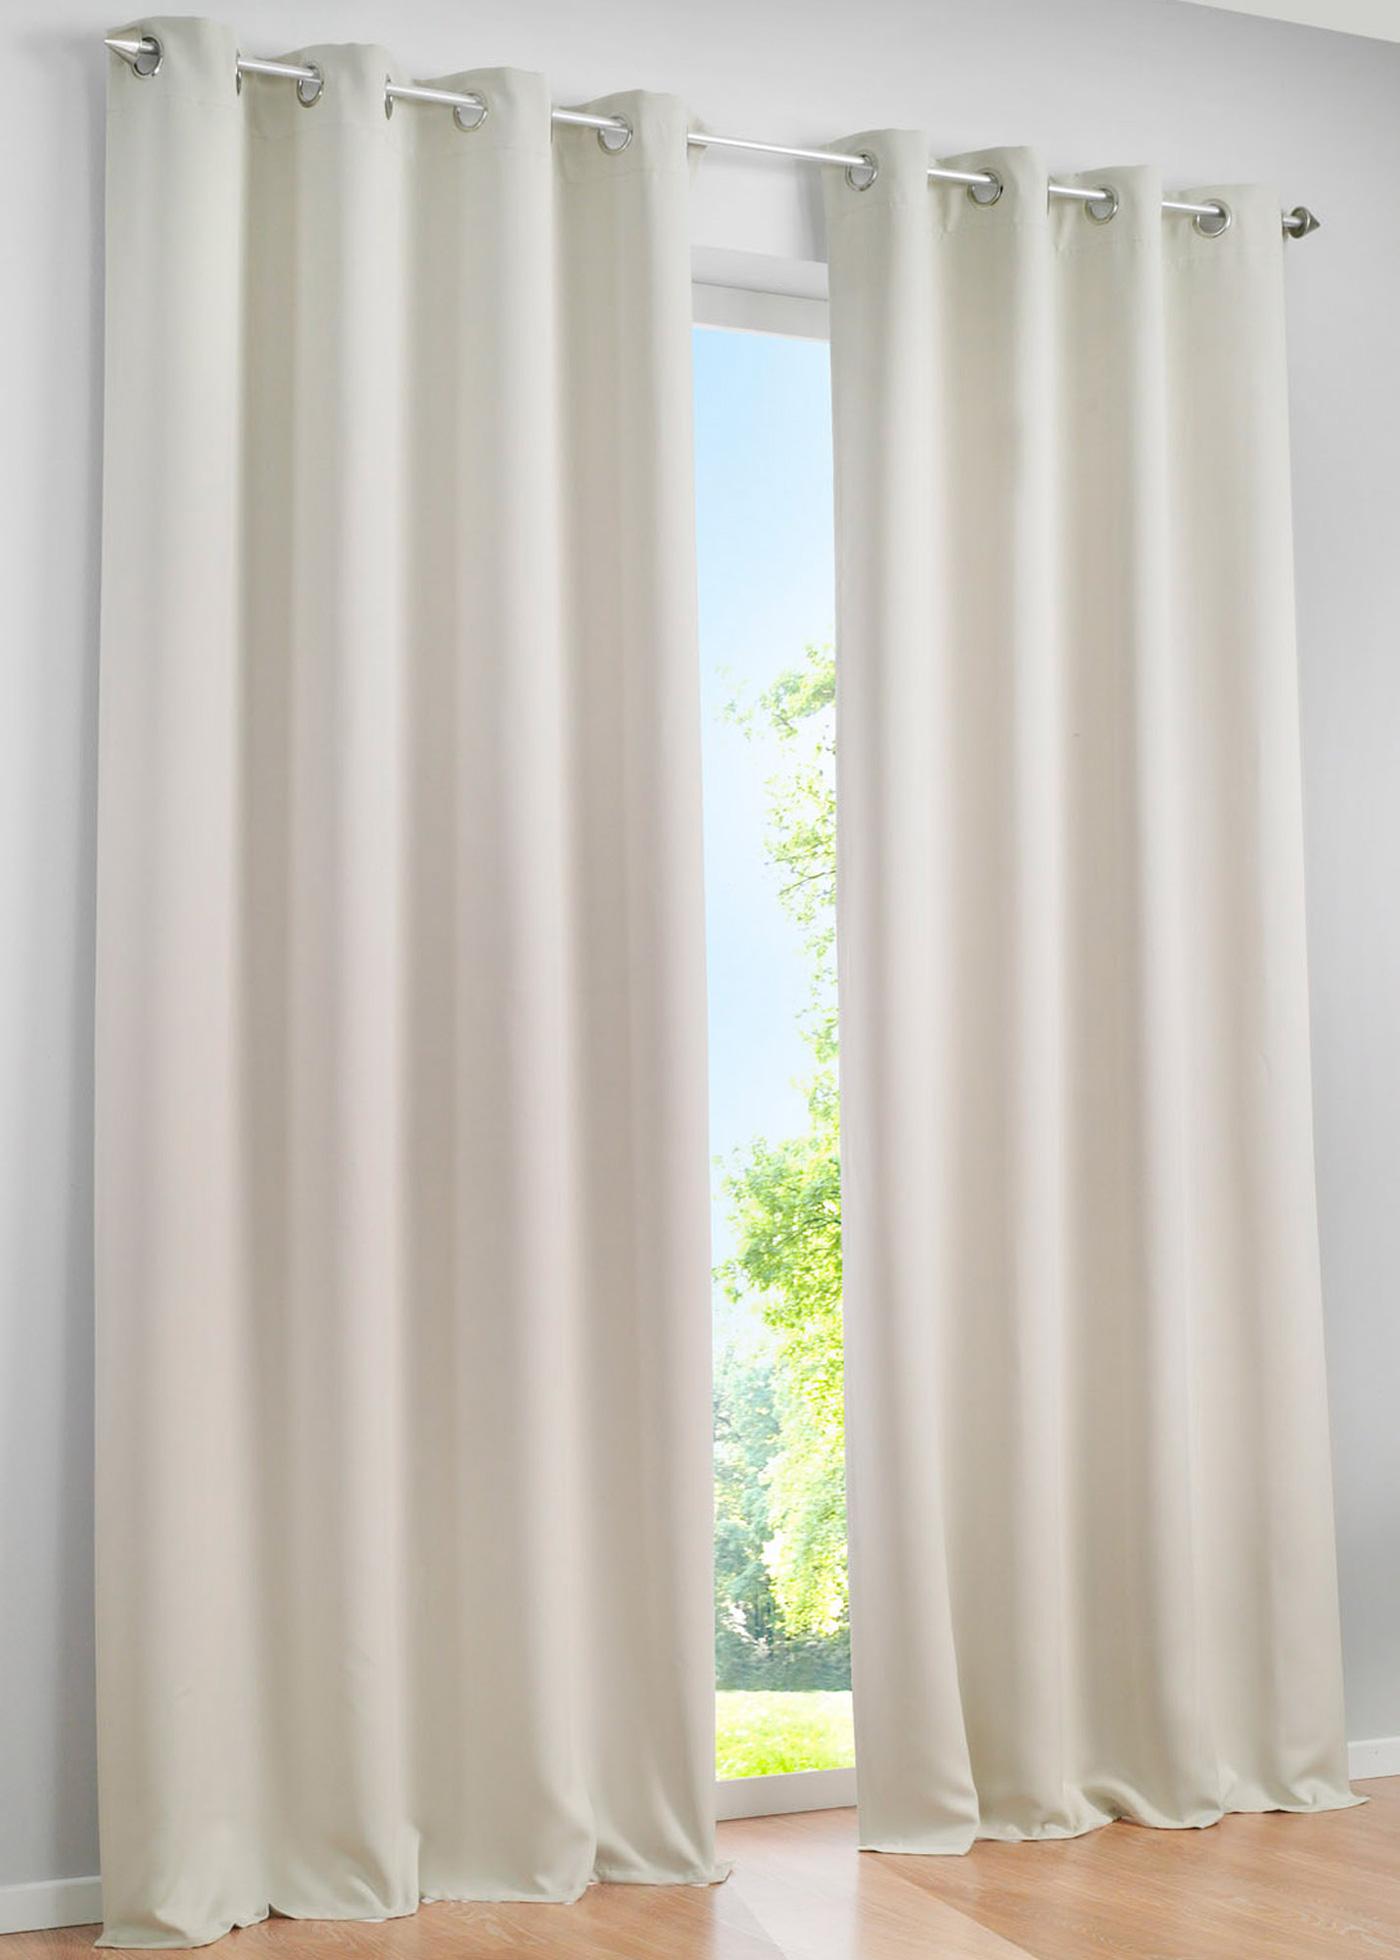 leinen vorh nge ikea leinen gardinen ikea gardinen 2018 gardinen ideen leinen pauwnieuws. Black Bedroom Furniture Sets. Home Design Ideas